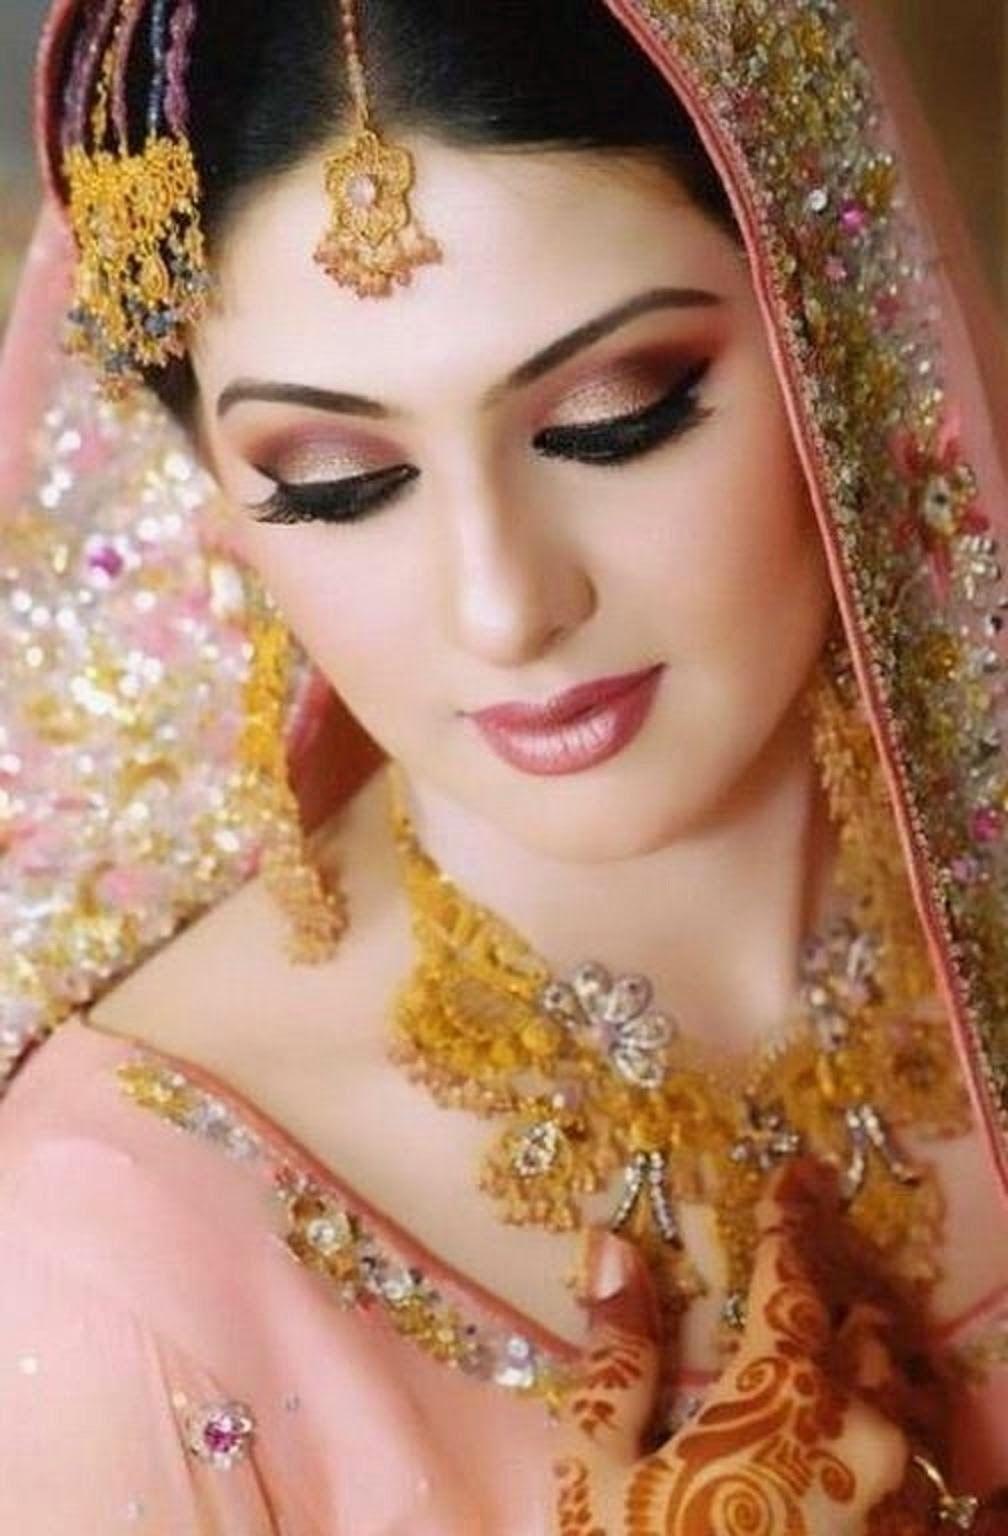 pakistani bridal makeup pictures 2012 - wavy haircut